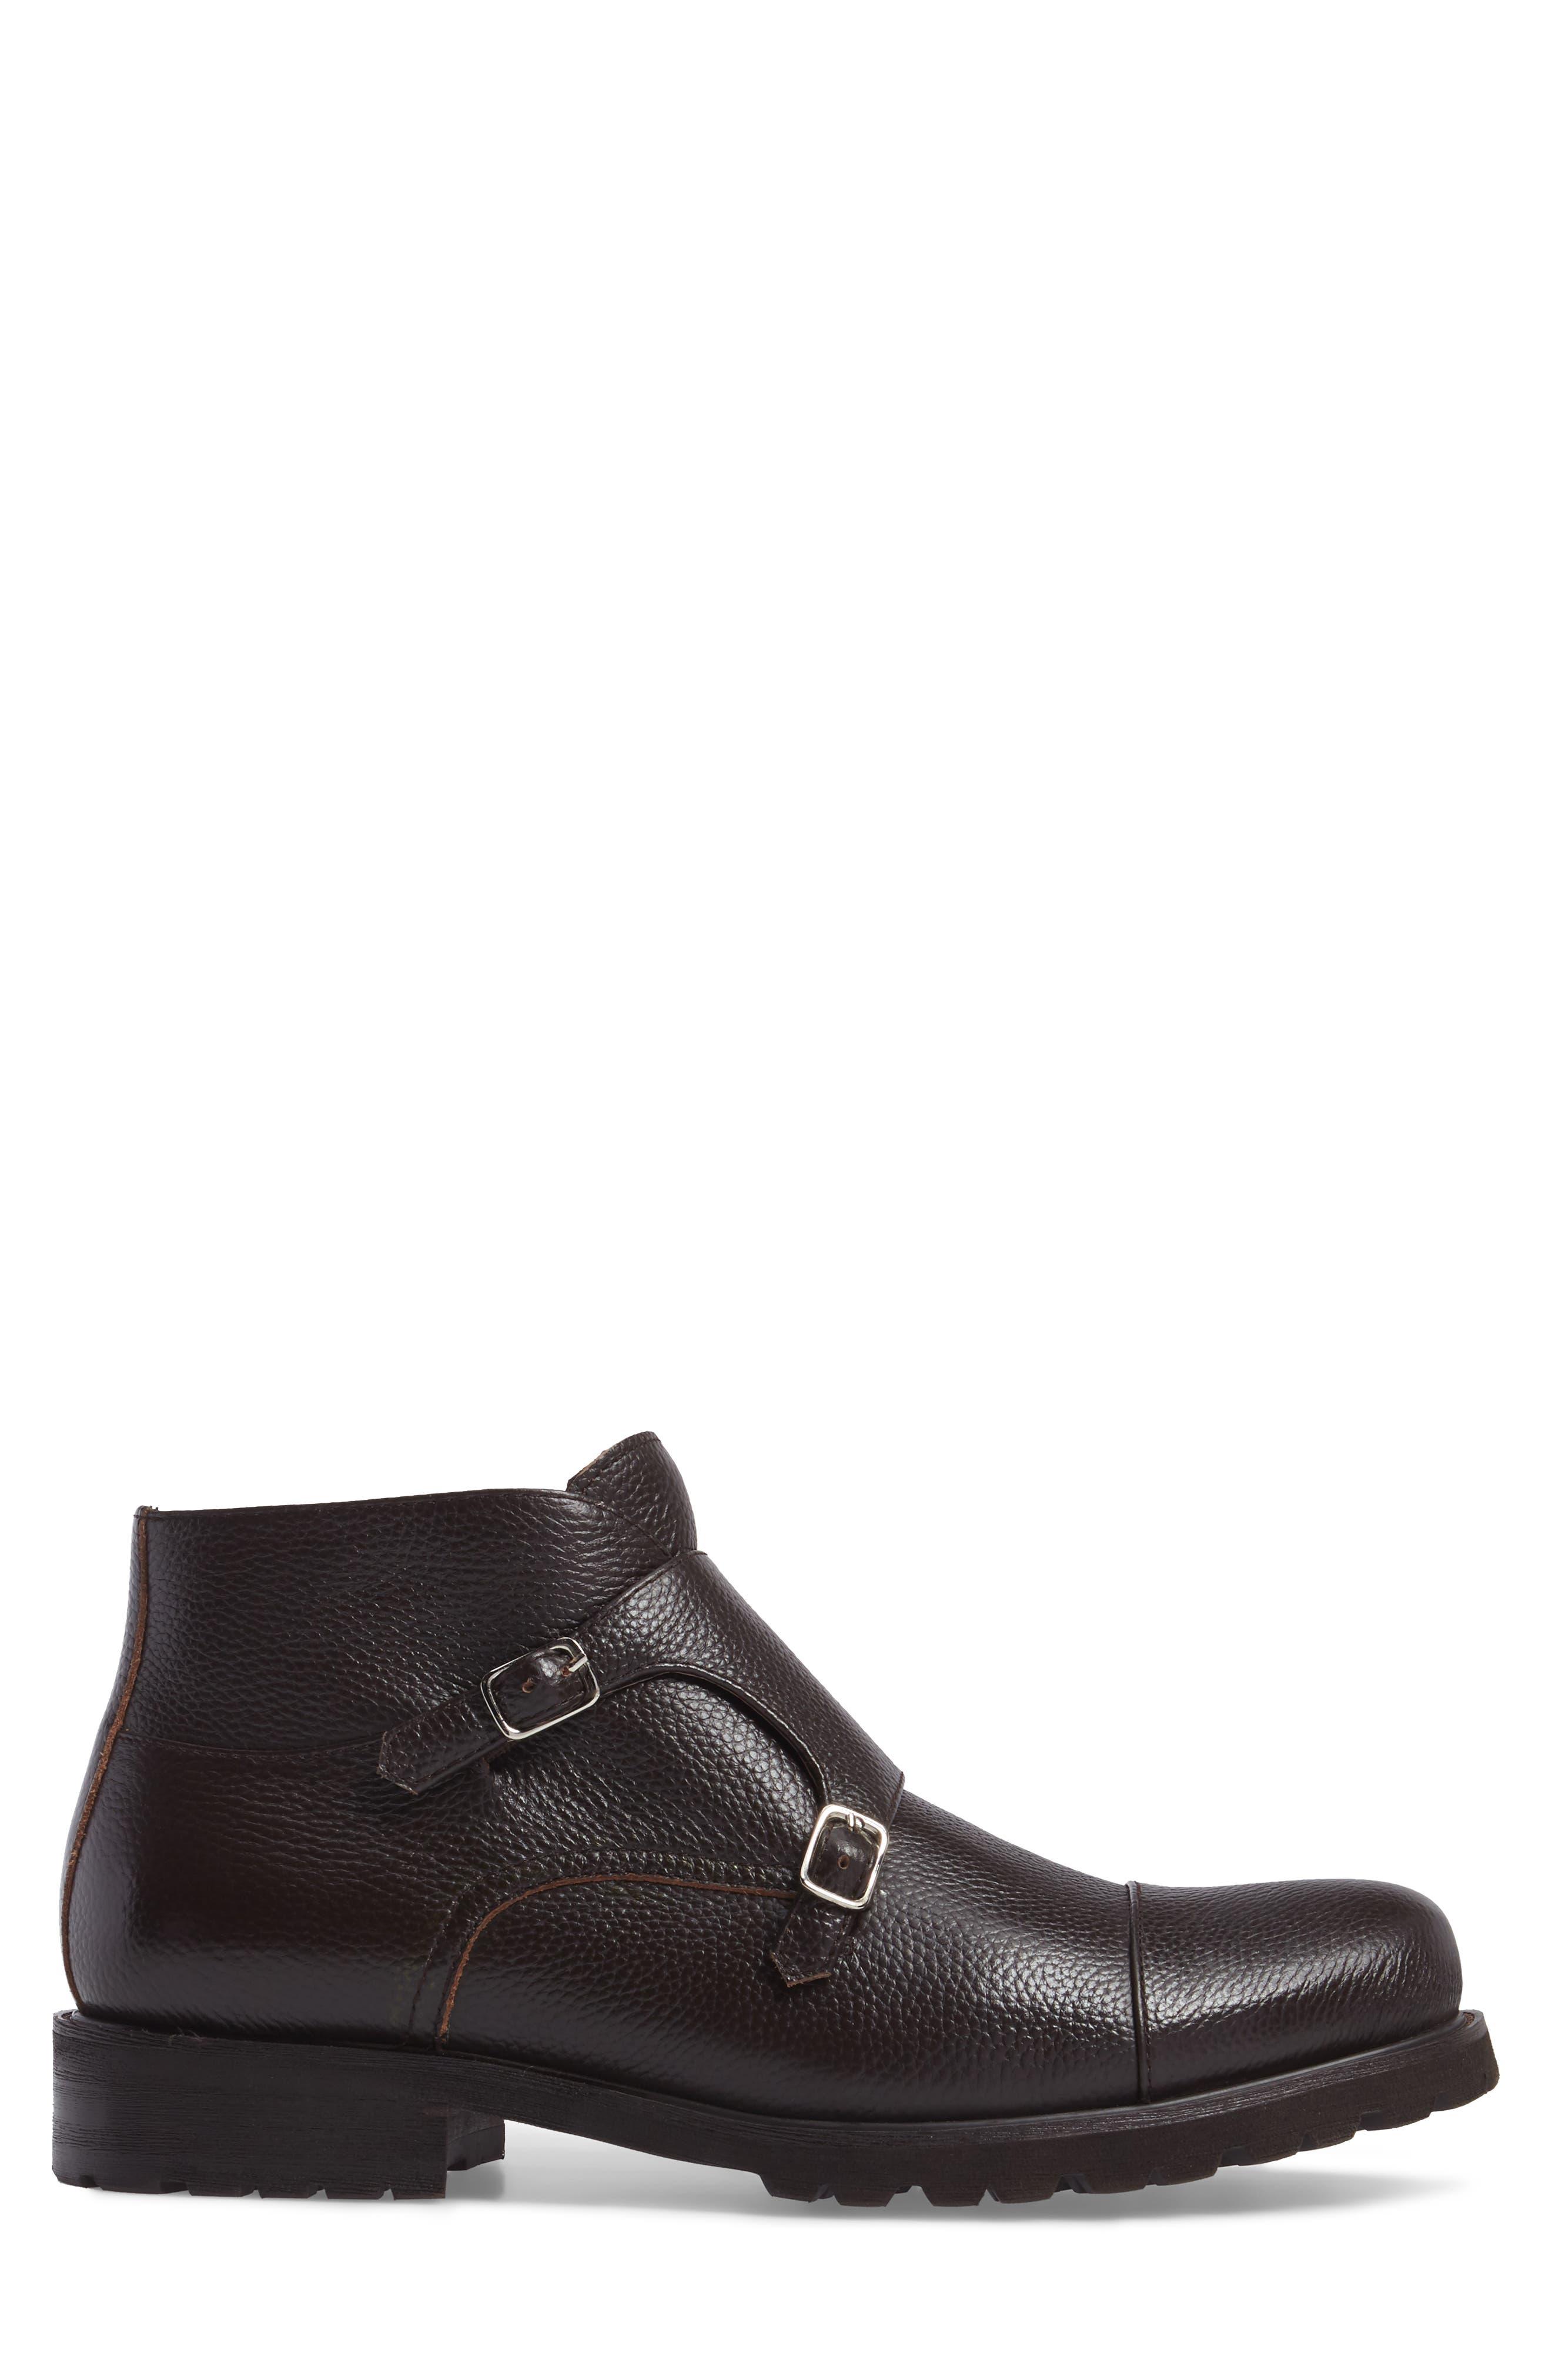 Koller Cap Toe Double Monk Boot,                             Alternate thumbnail 3, color,                             Black Leather